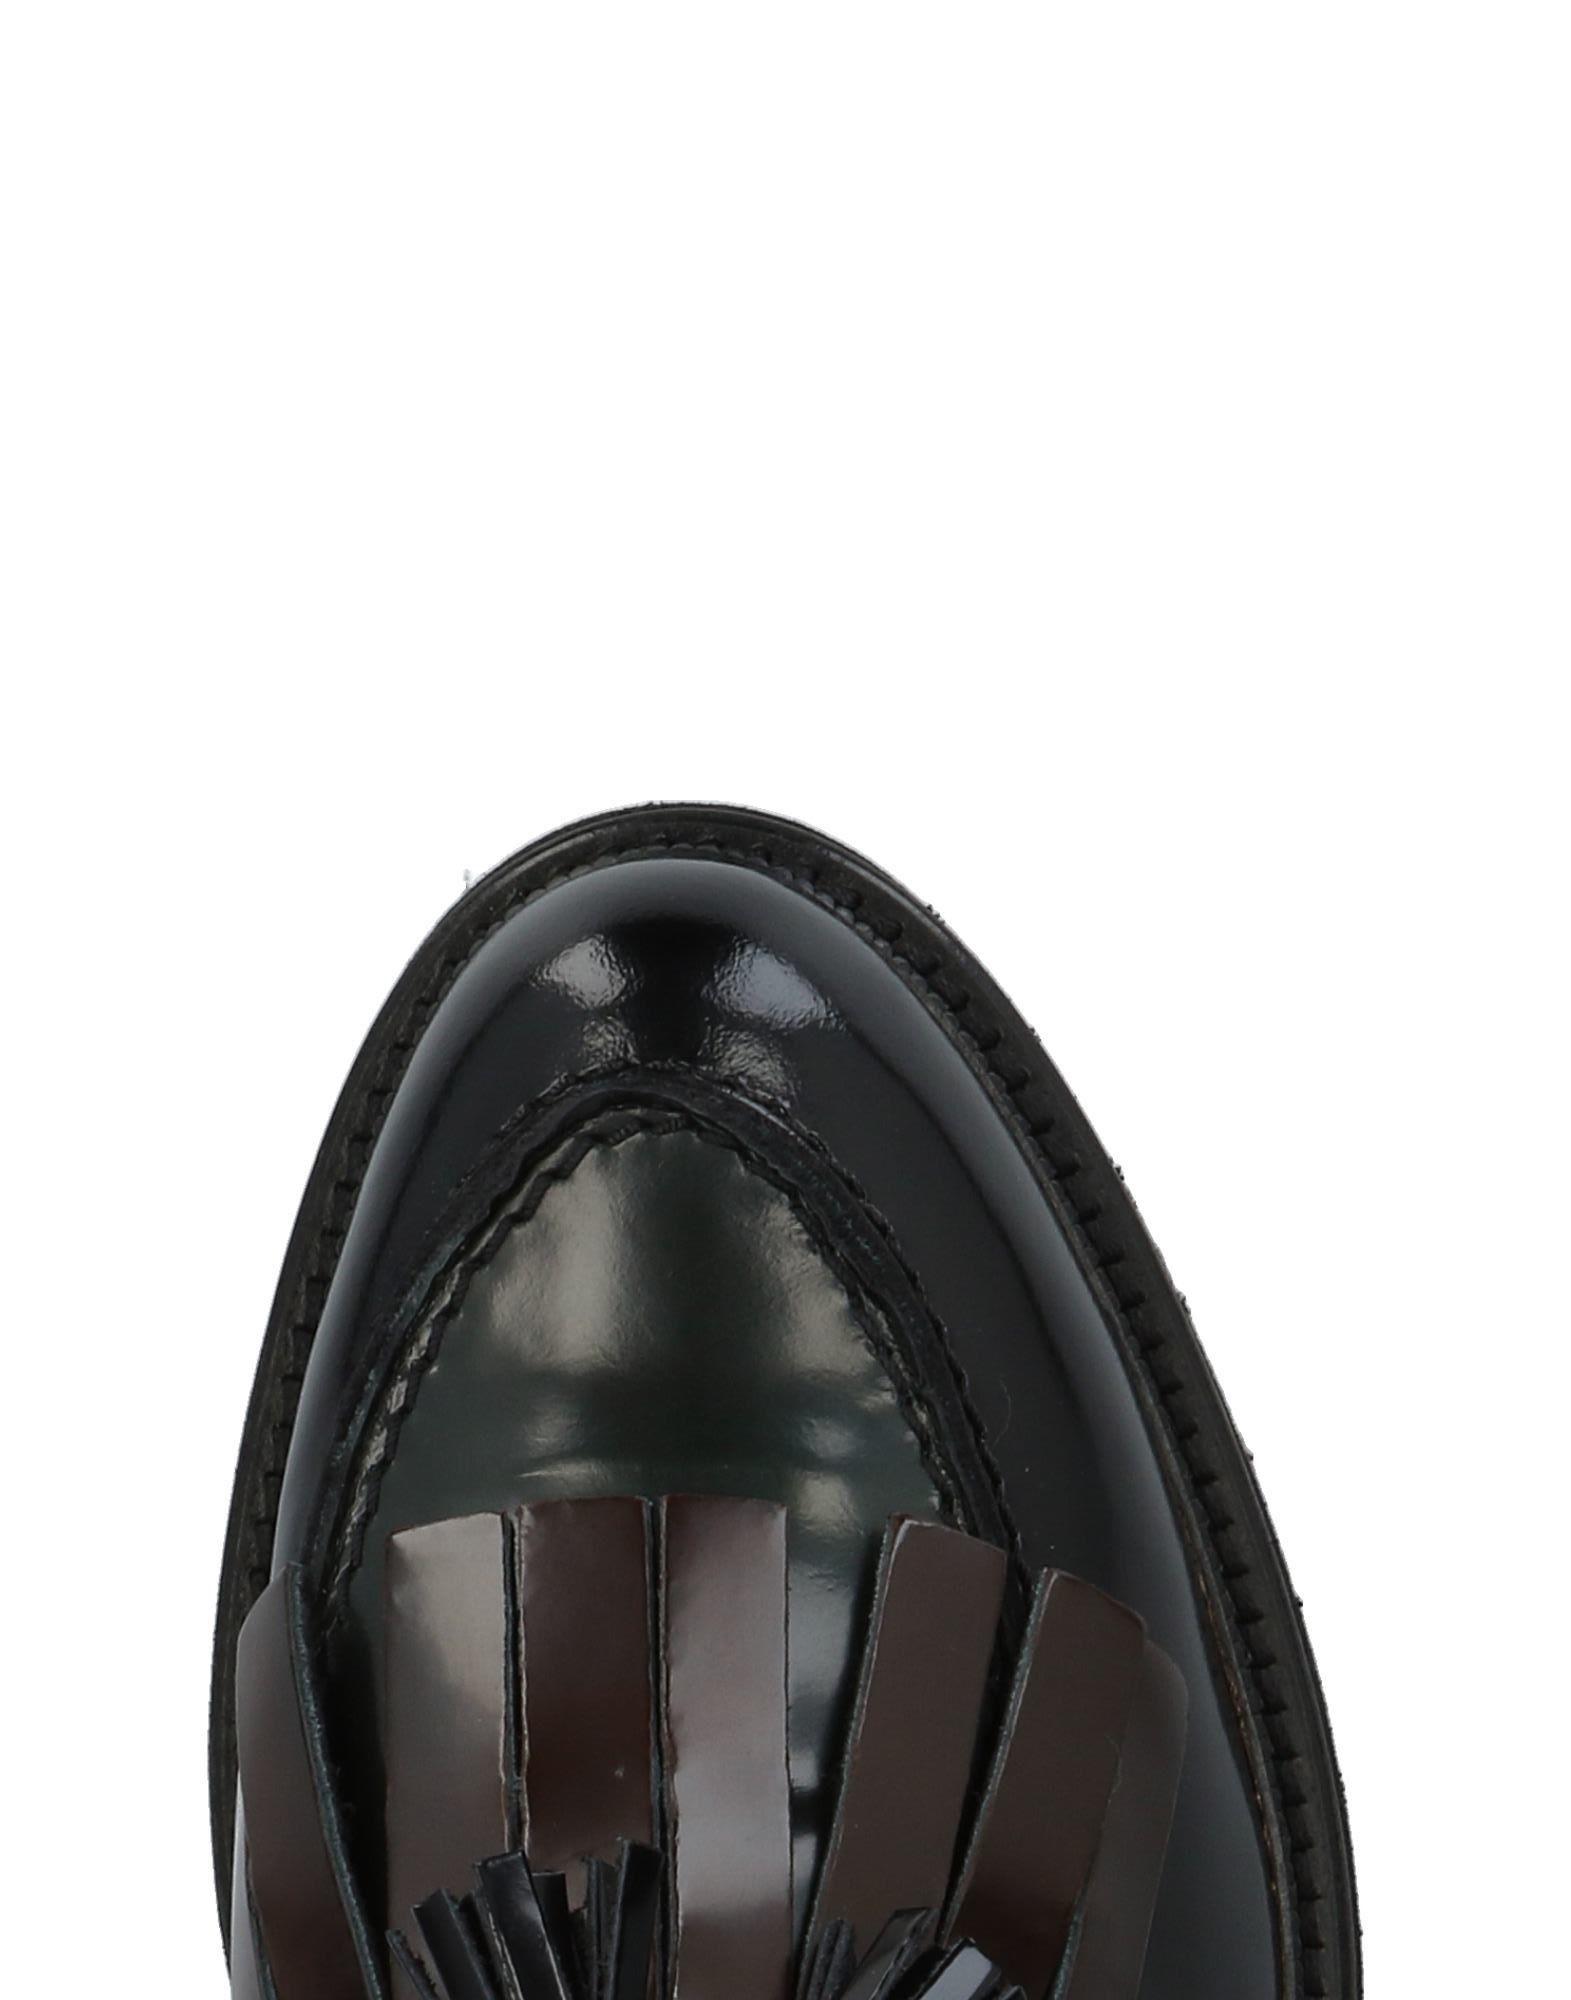 Alfredo Giantin Gute Mokassins Damen  11495263BI Gute Giantin Qualität beliebte Schuhe c3bc0c